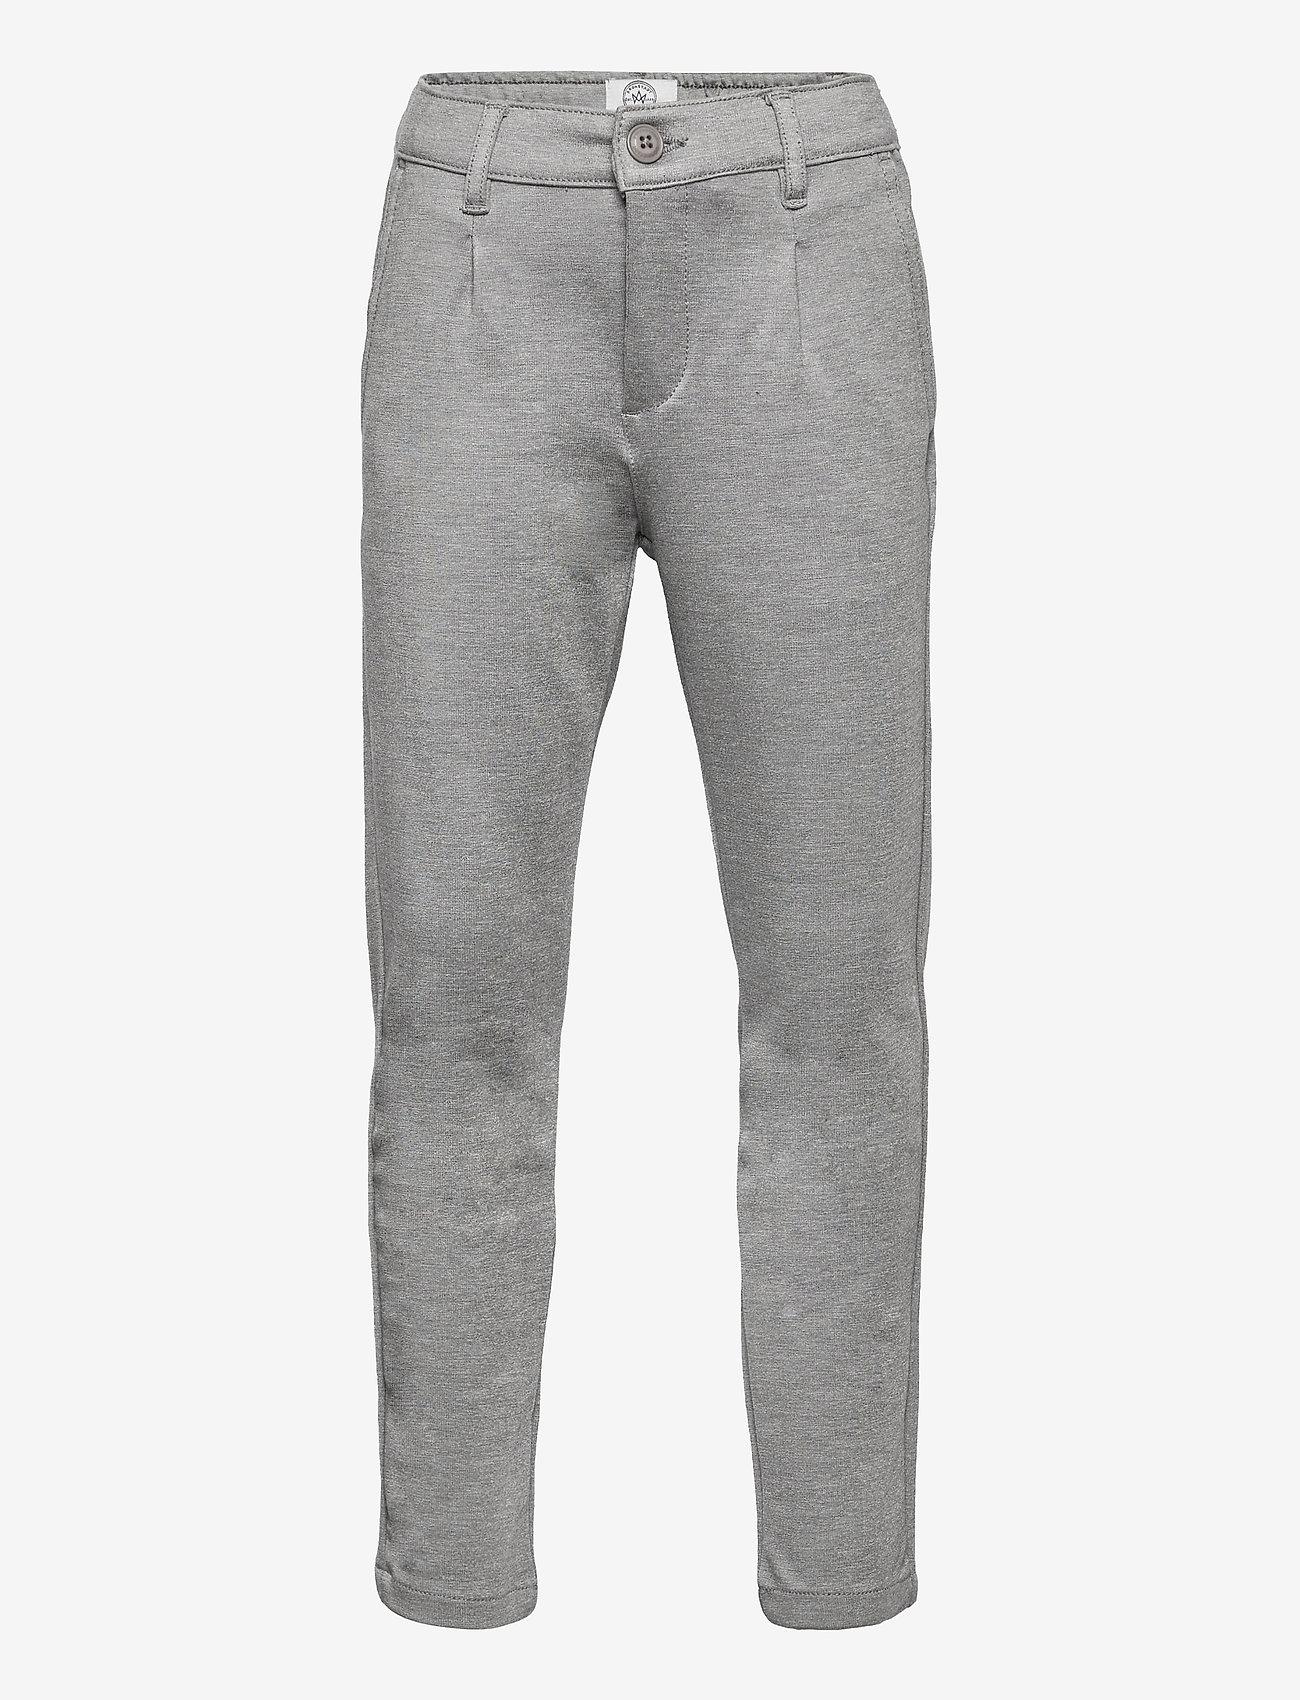 Kronstadt - Club Pants - trousers - light grey - 0